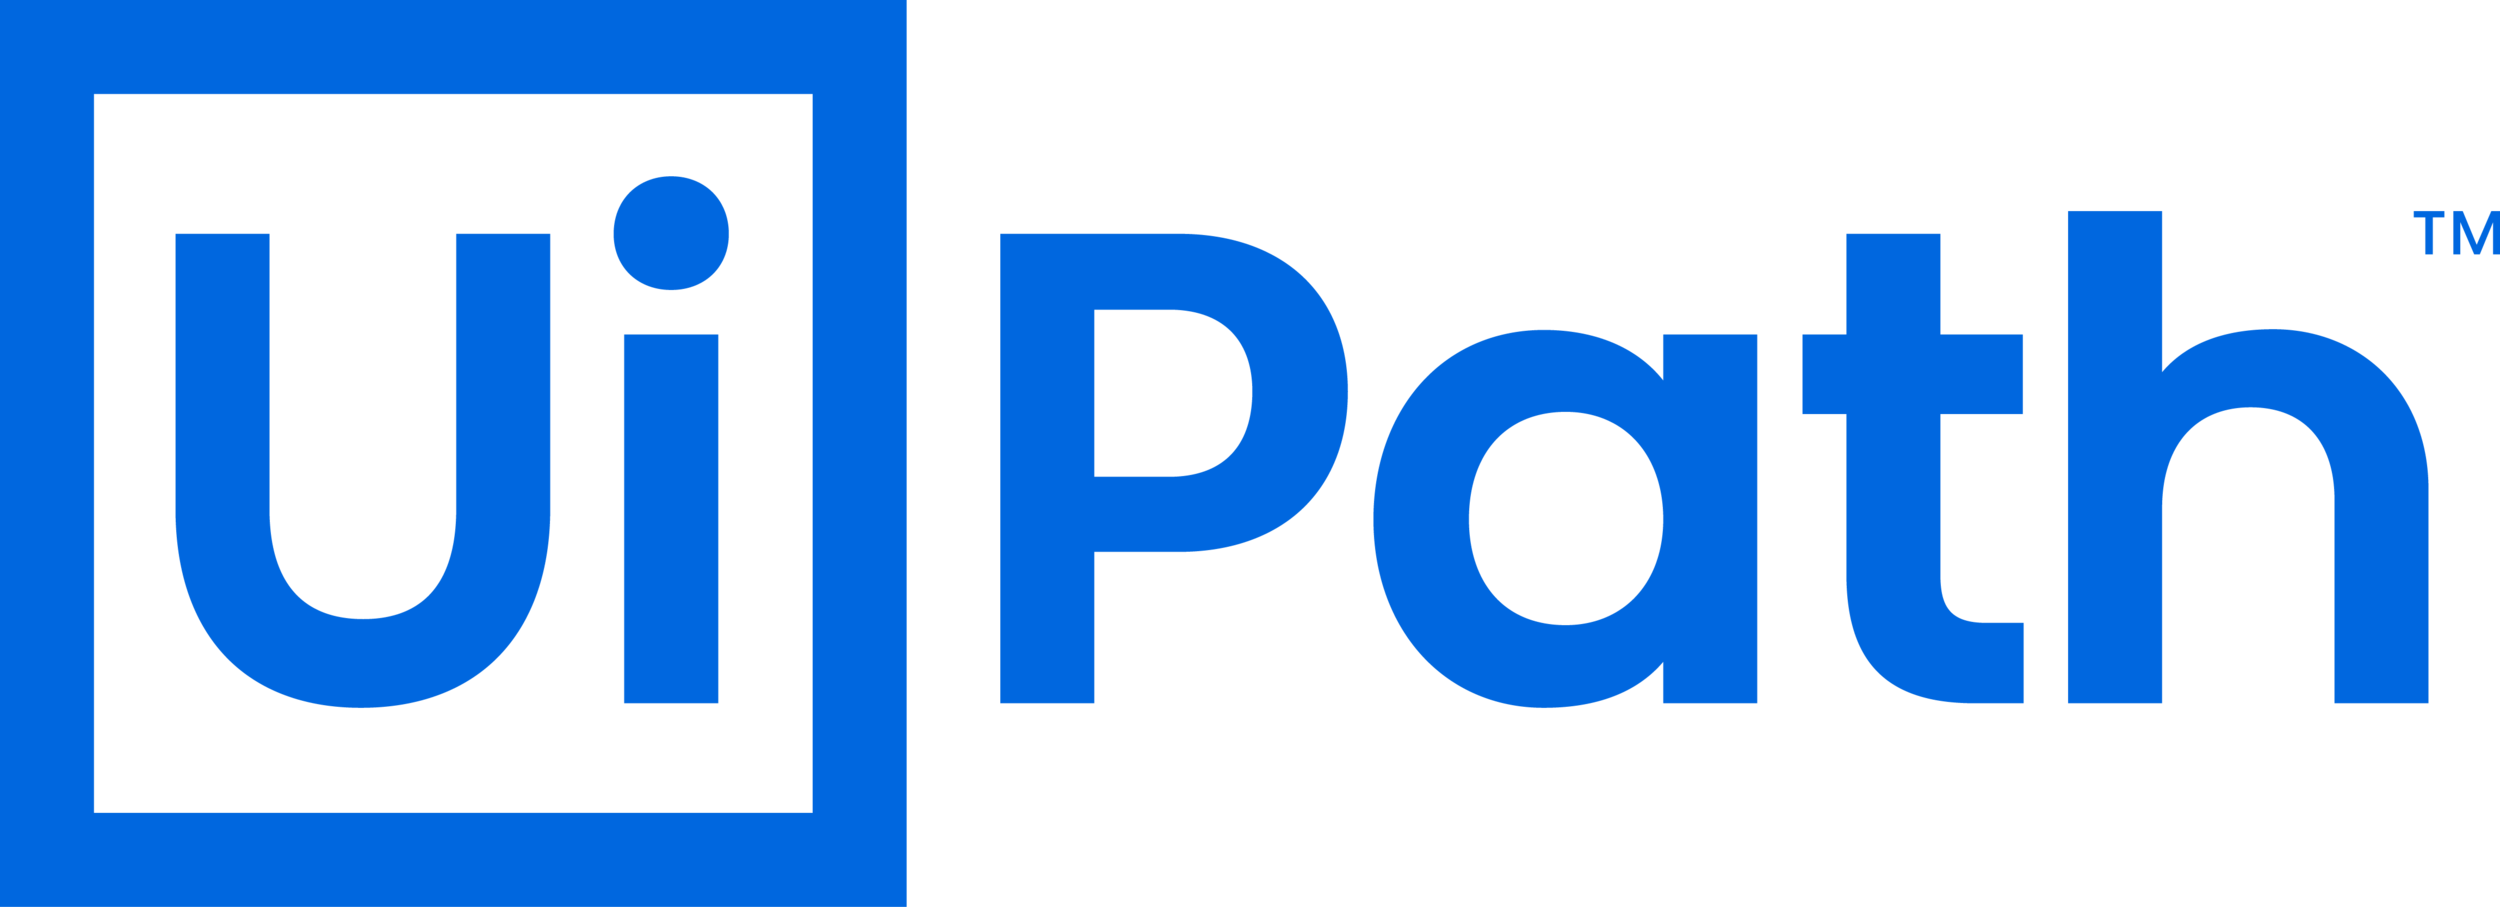 UiPath-Blue.PNG